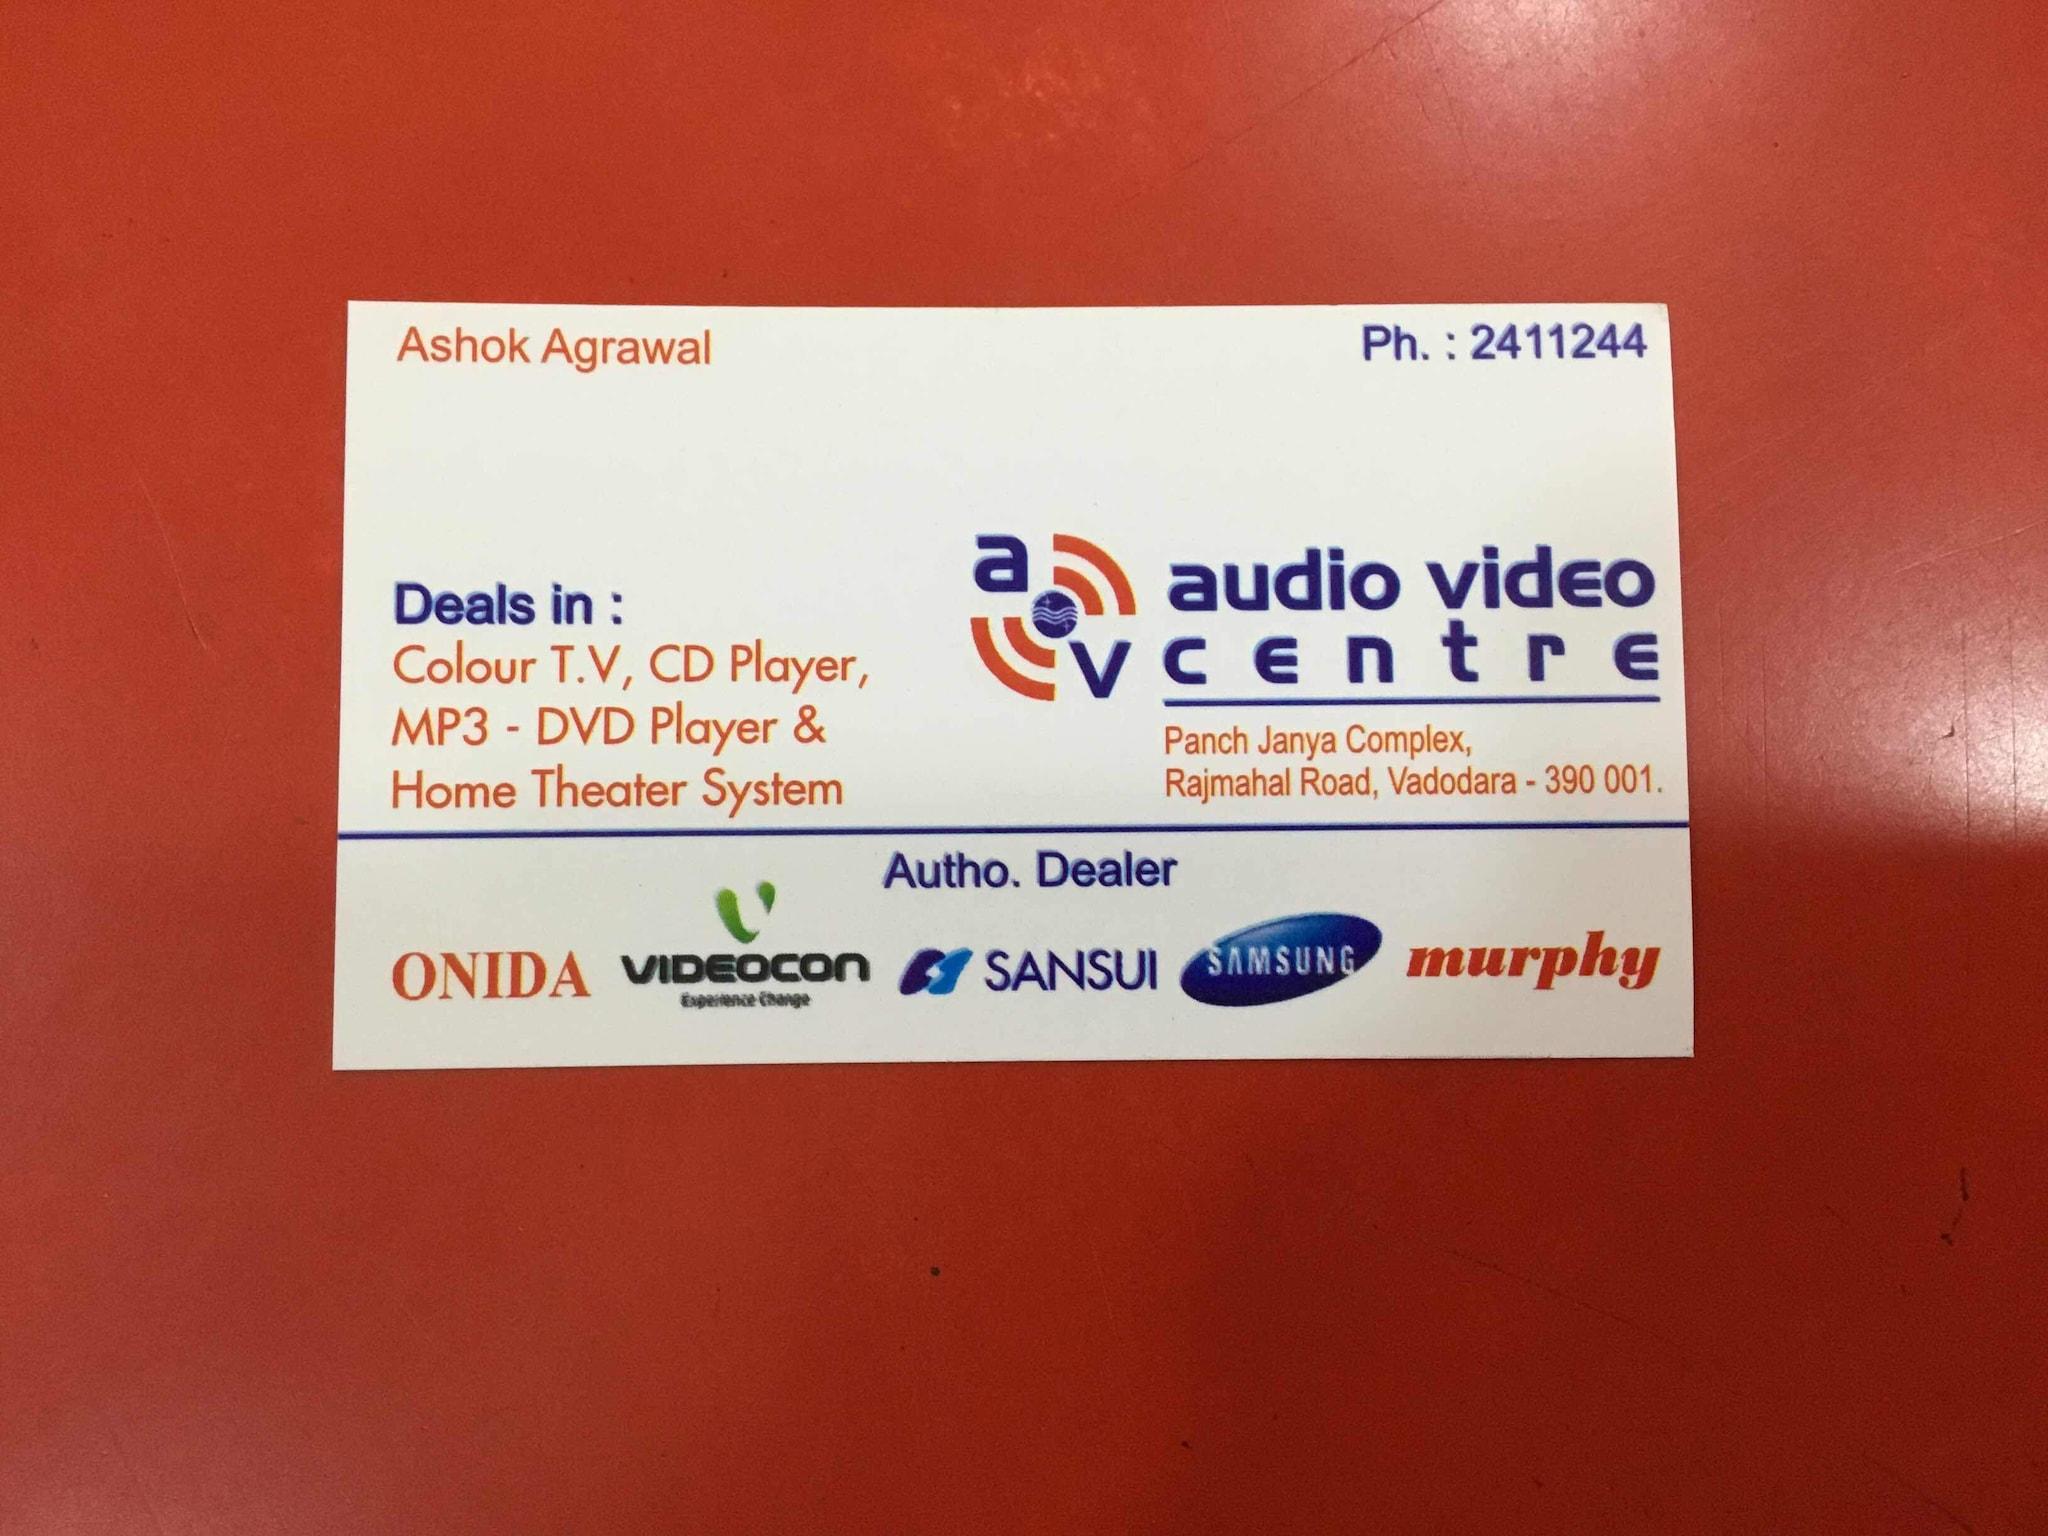 Top Samsung Video Cd Player Dealers in Vadodara - Best Samsung Video